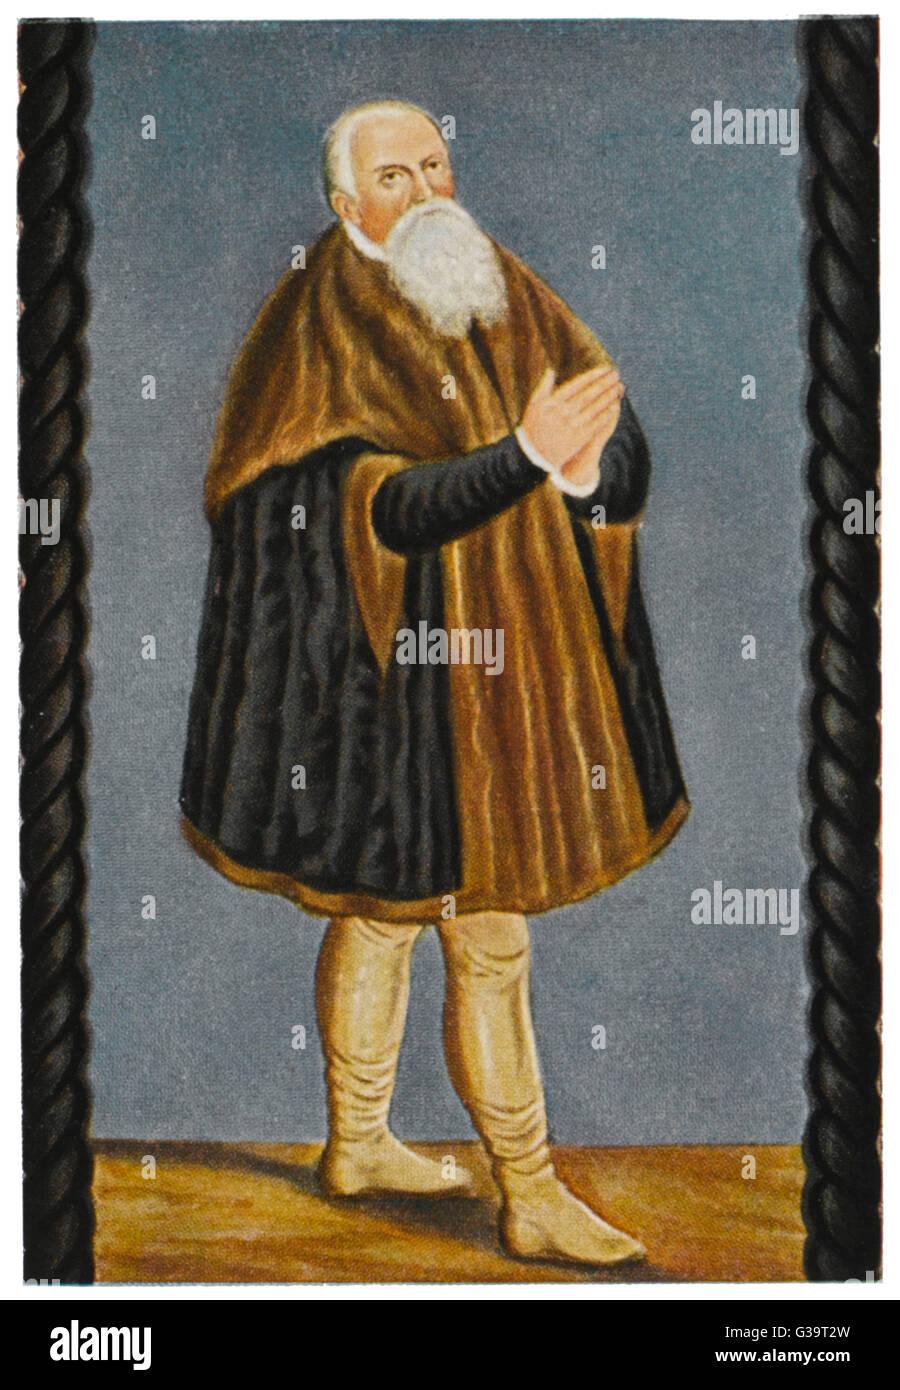 LUCAS CRANACH  German painter, engraver and woodcut designer      Date: 1472 - 1553 - Stock Image